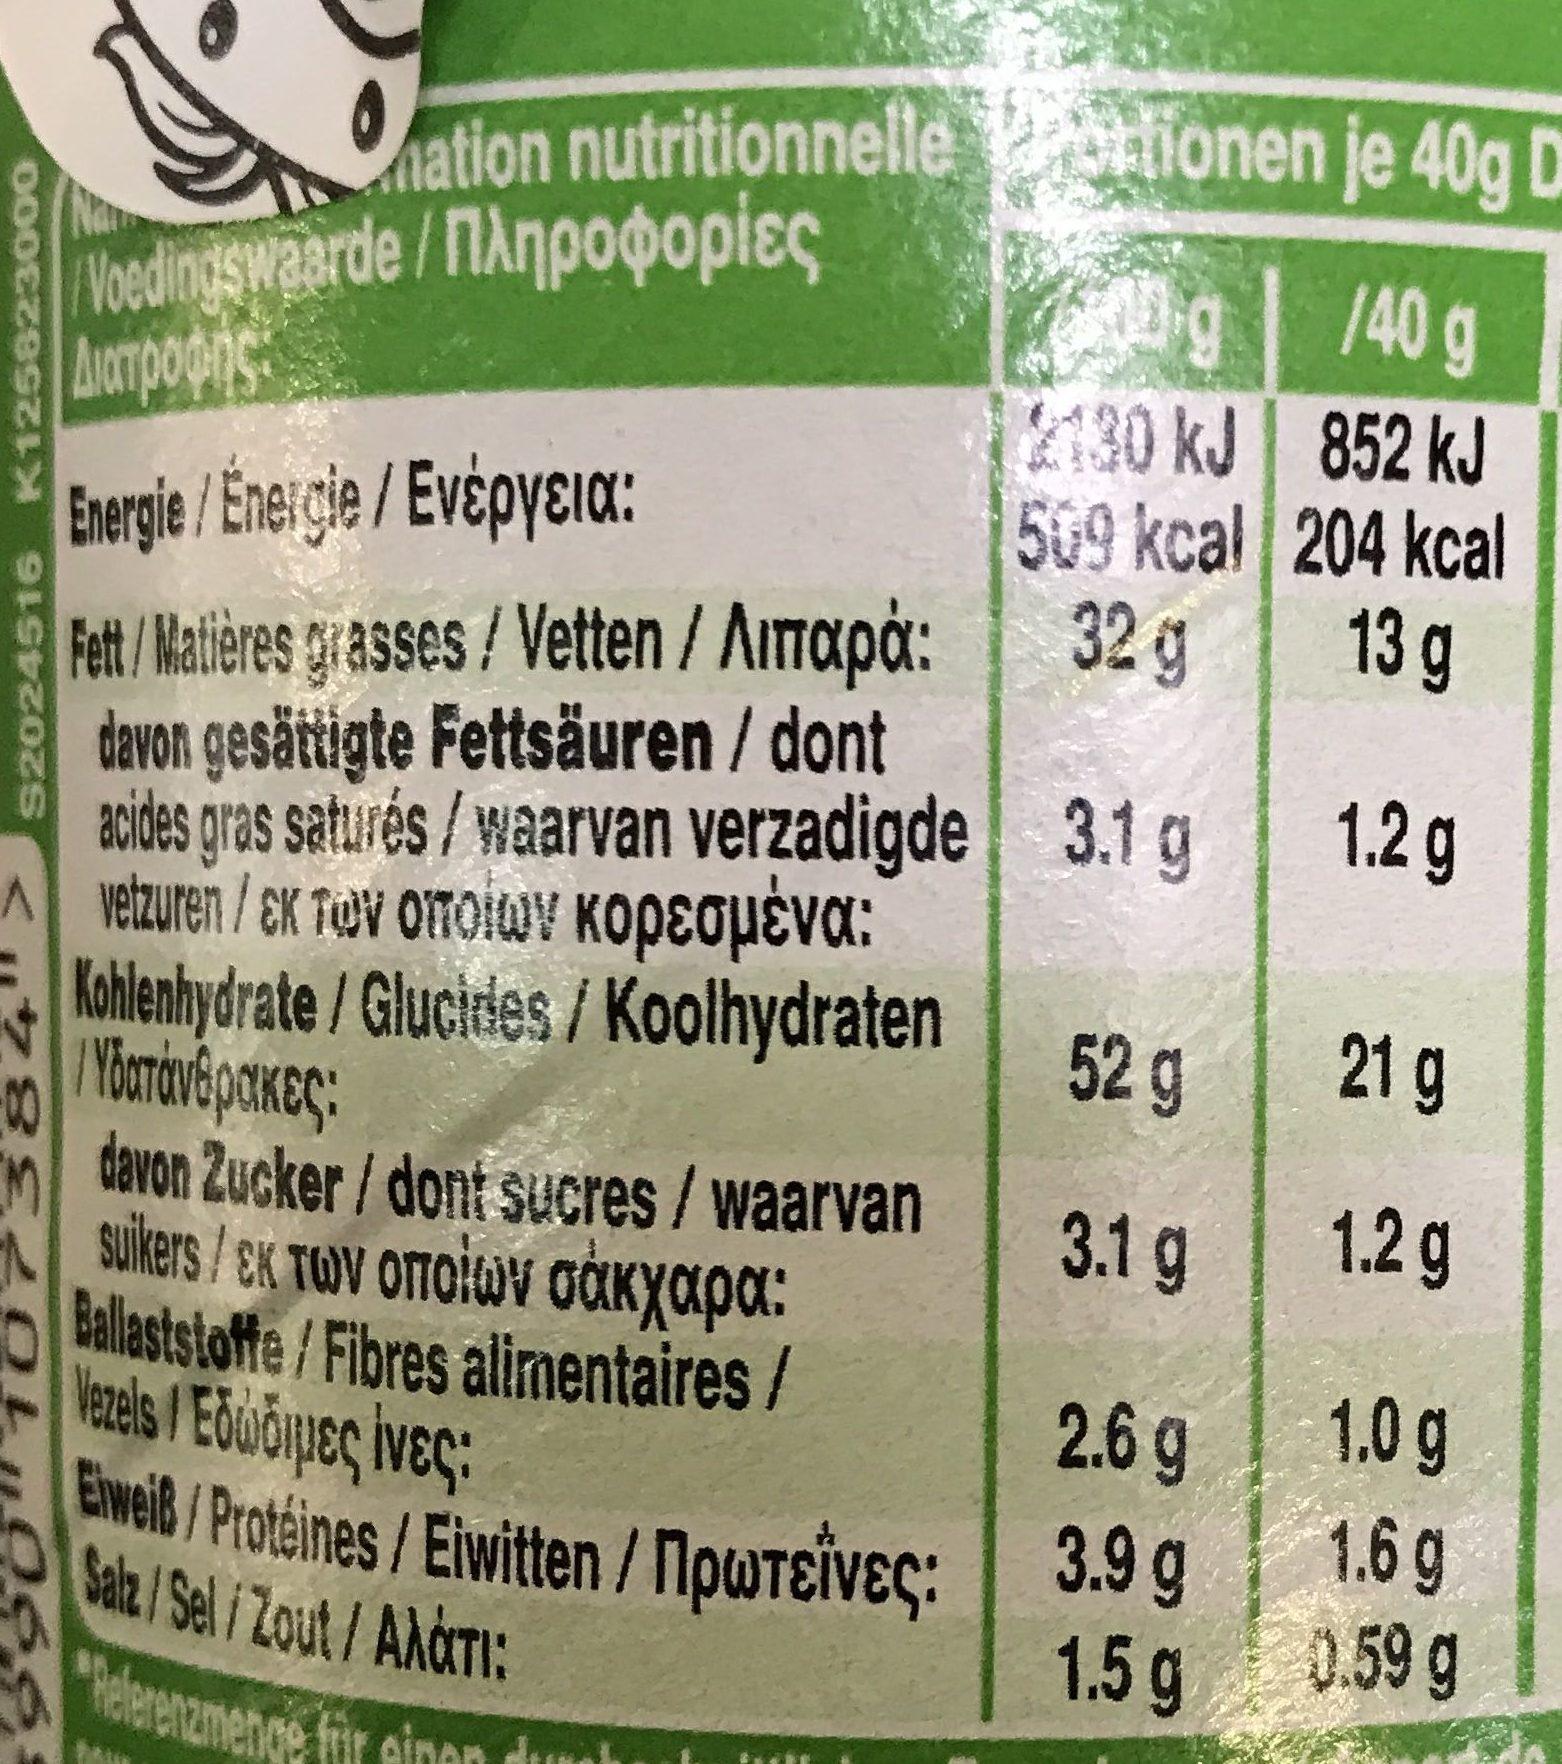 Sour Cream & Onion - Voedingswaarden - fr